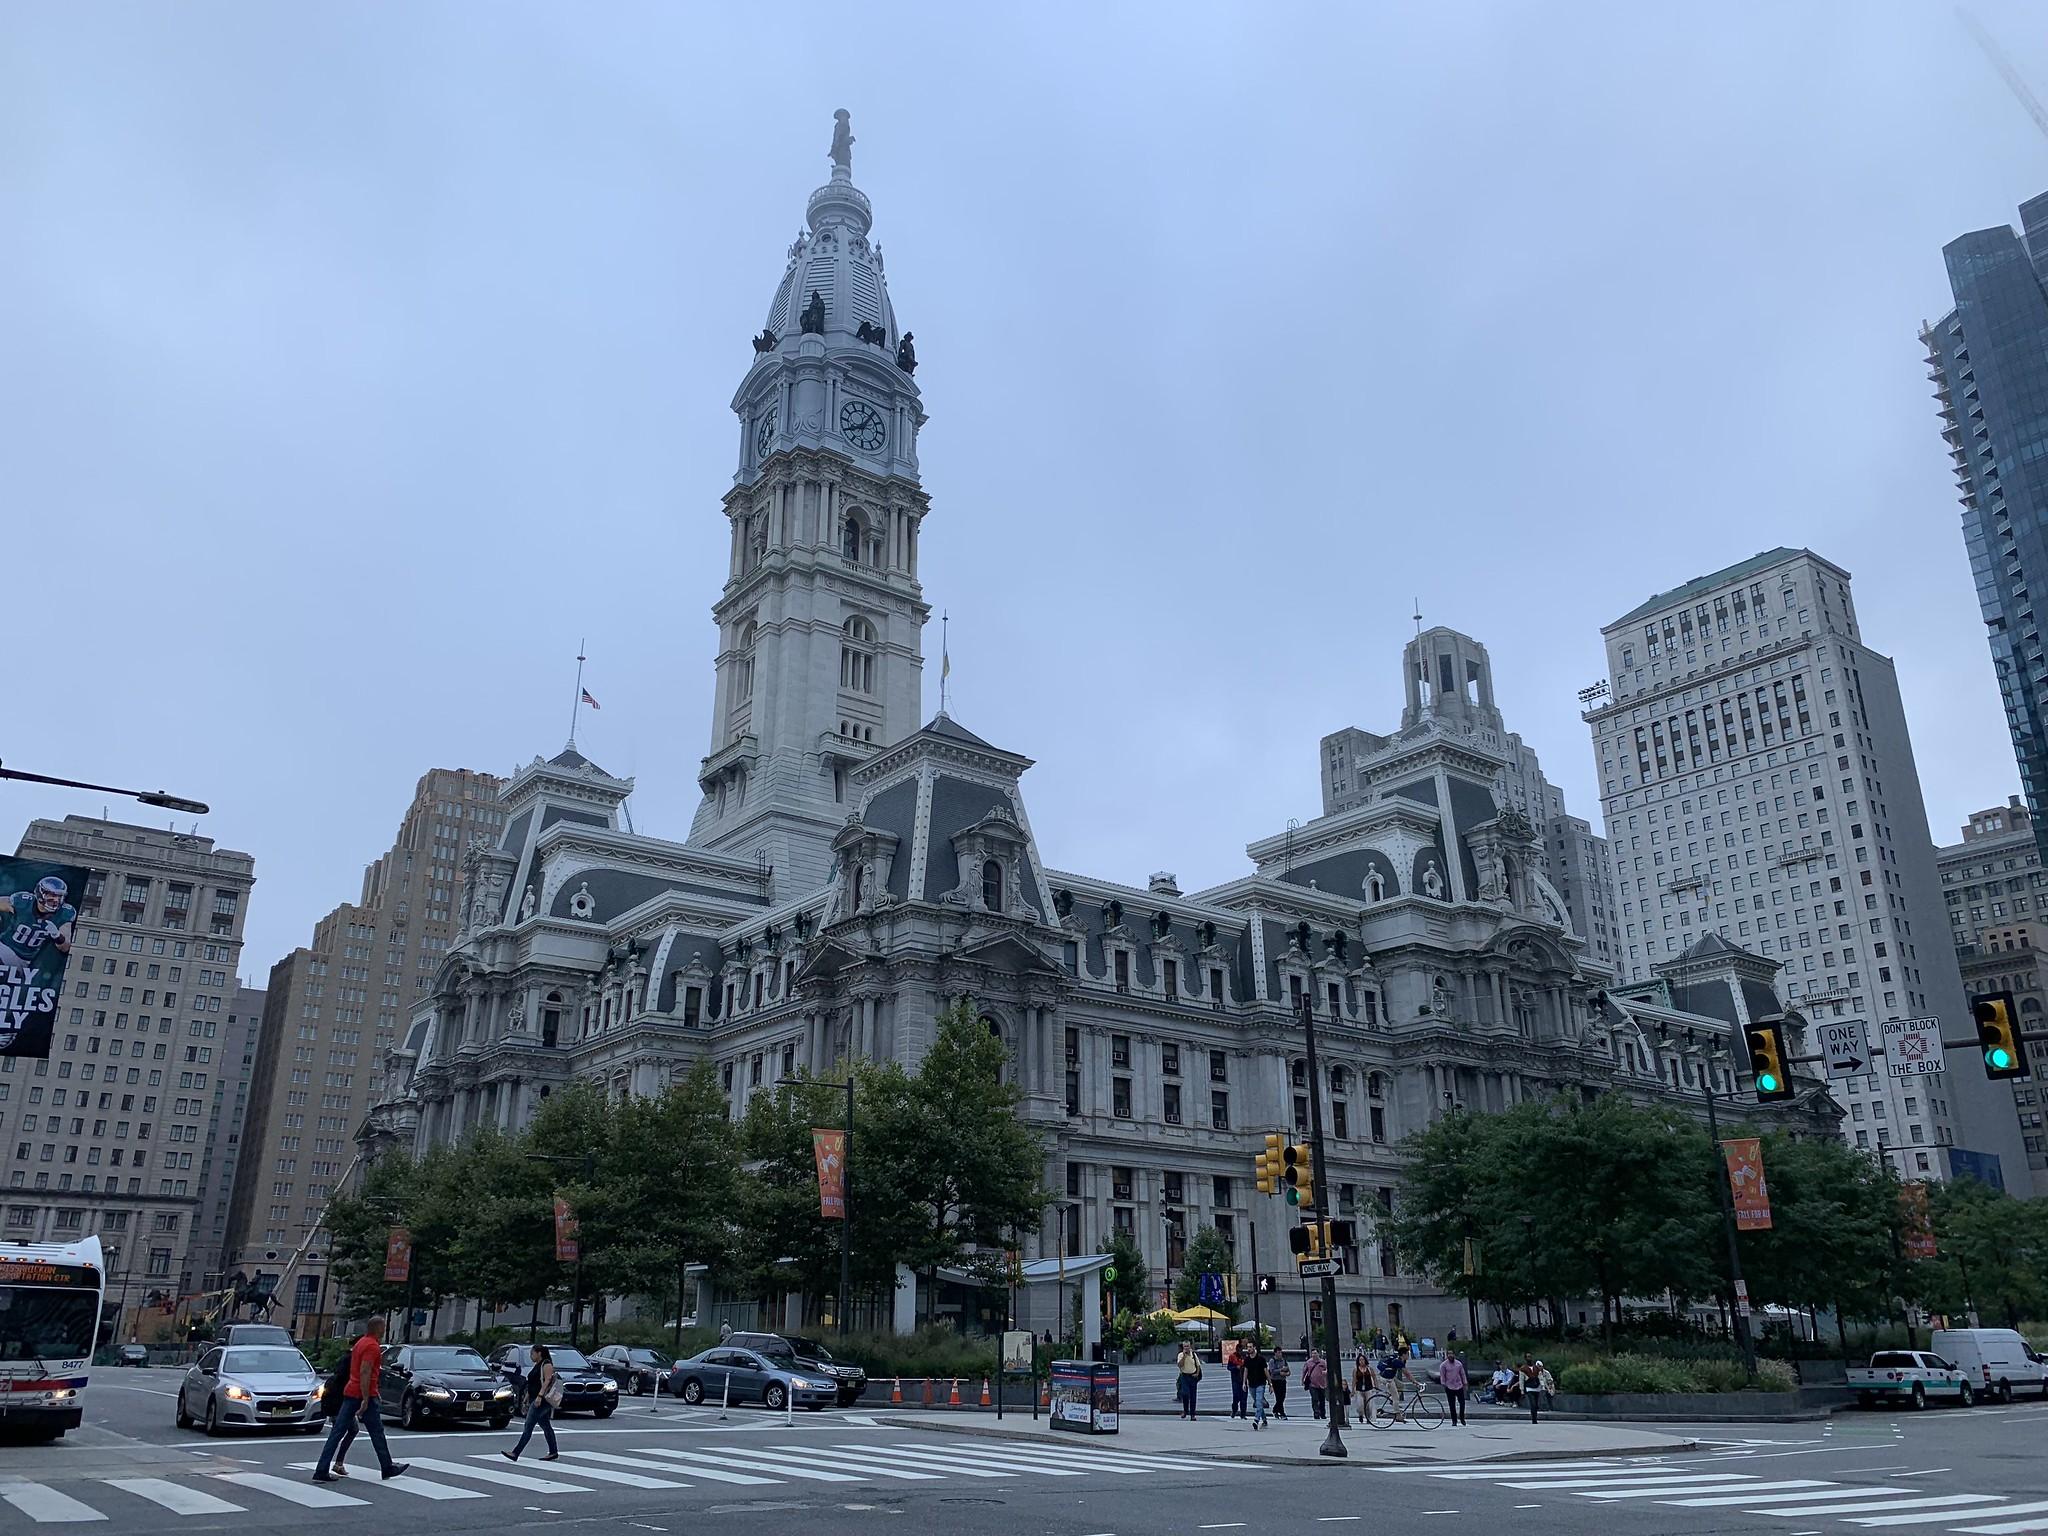 XS: City Hall